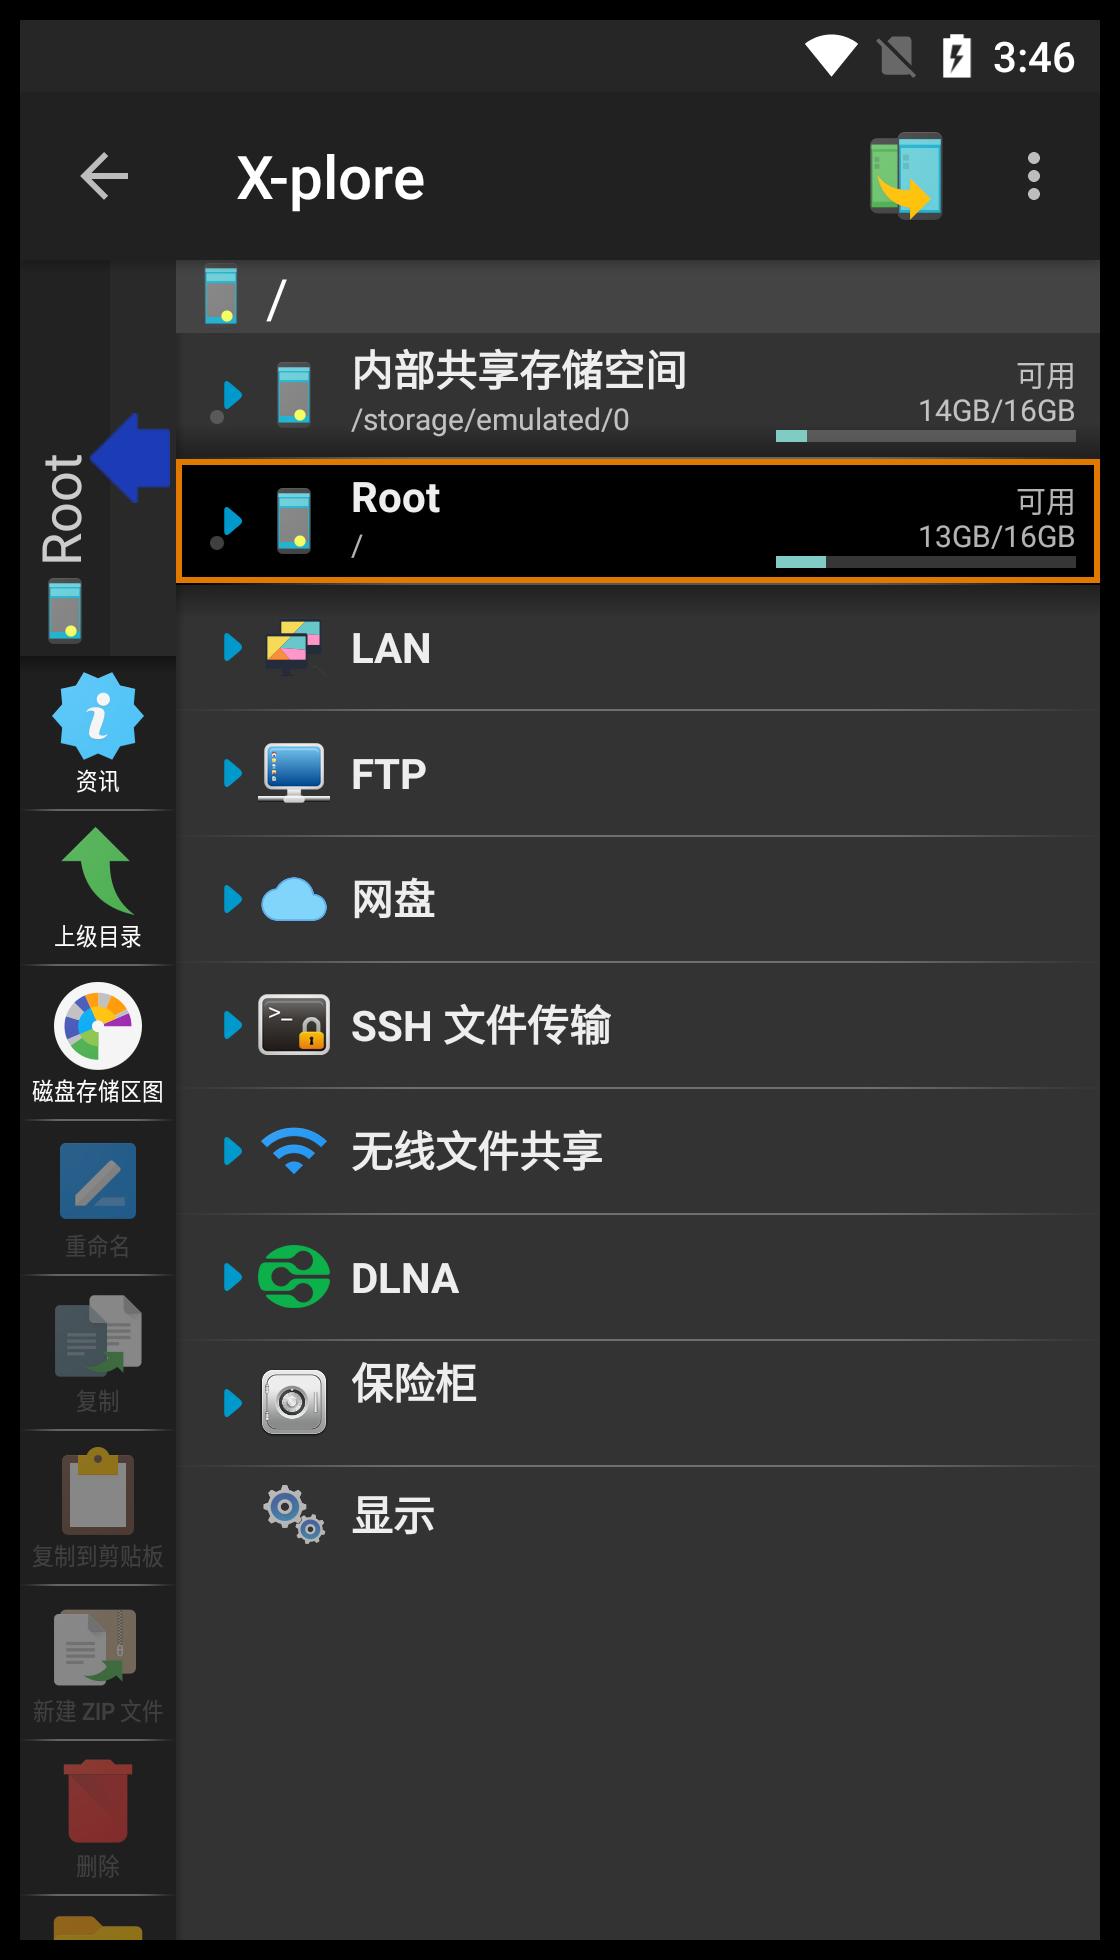 Screenshot_20211007-034645.png